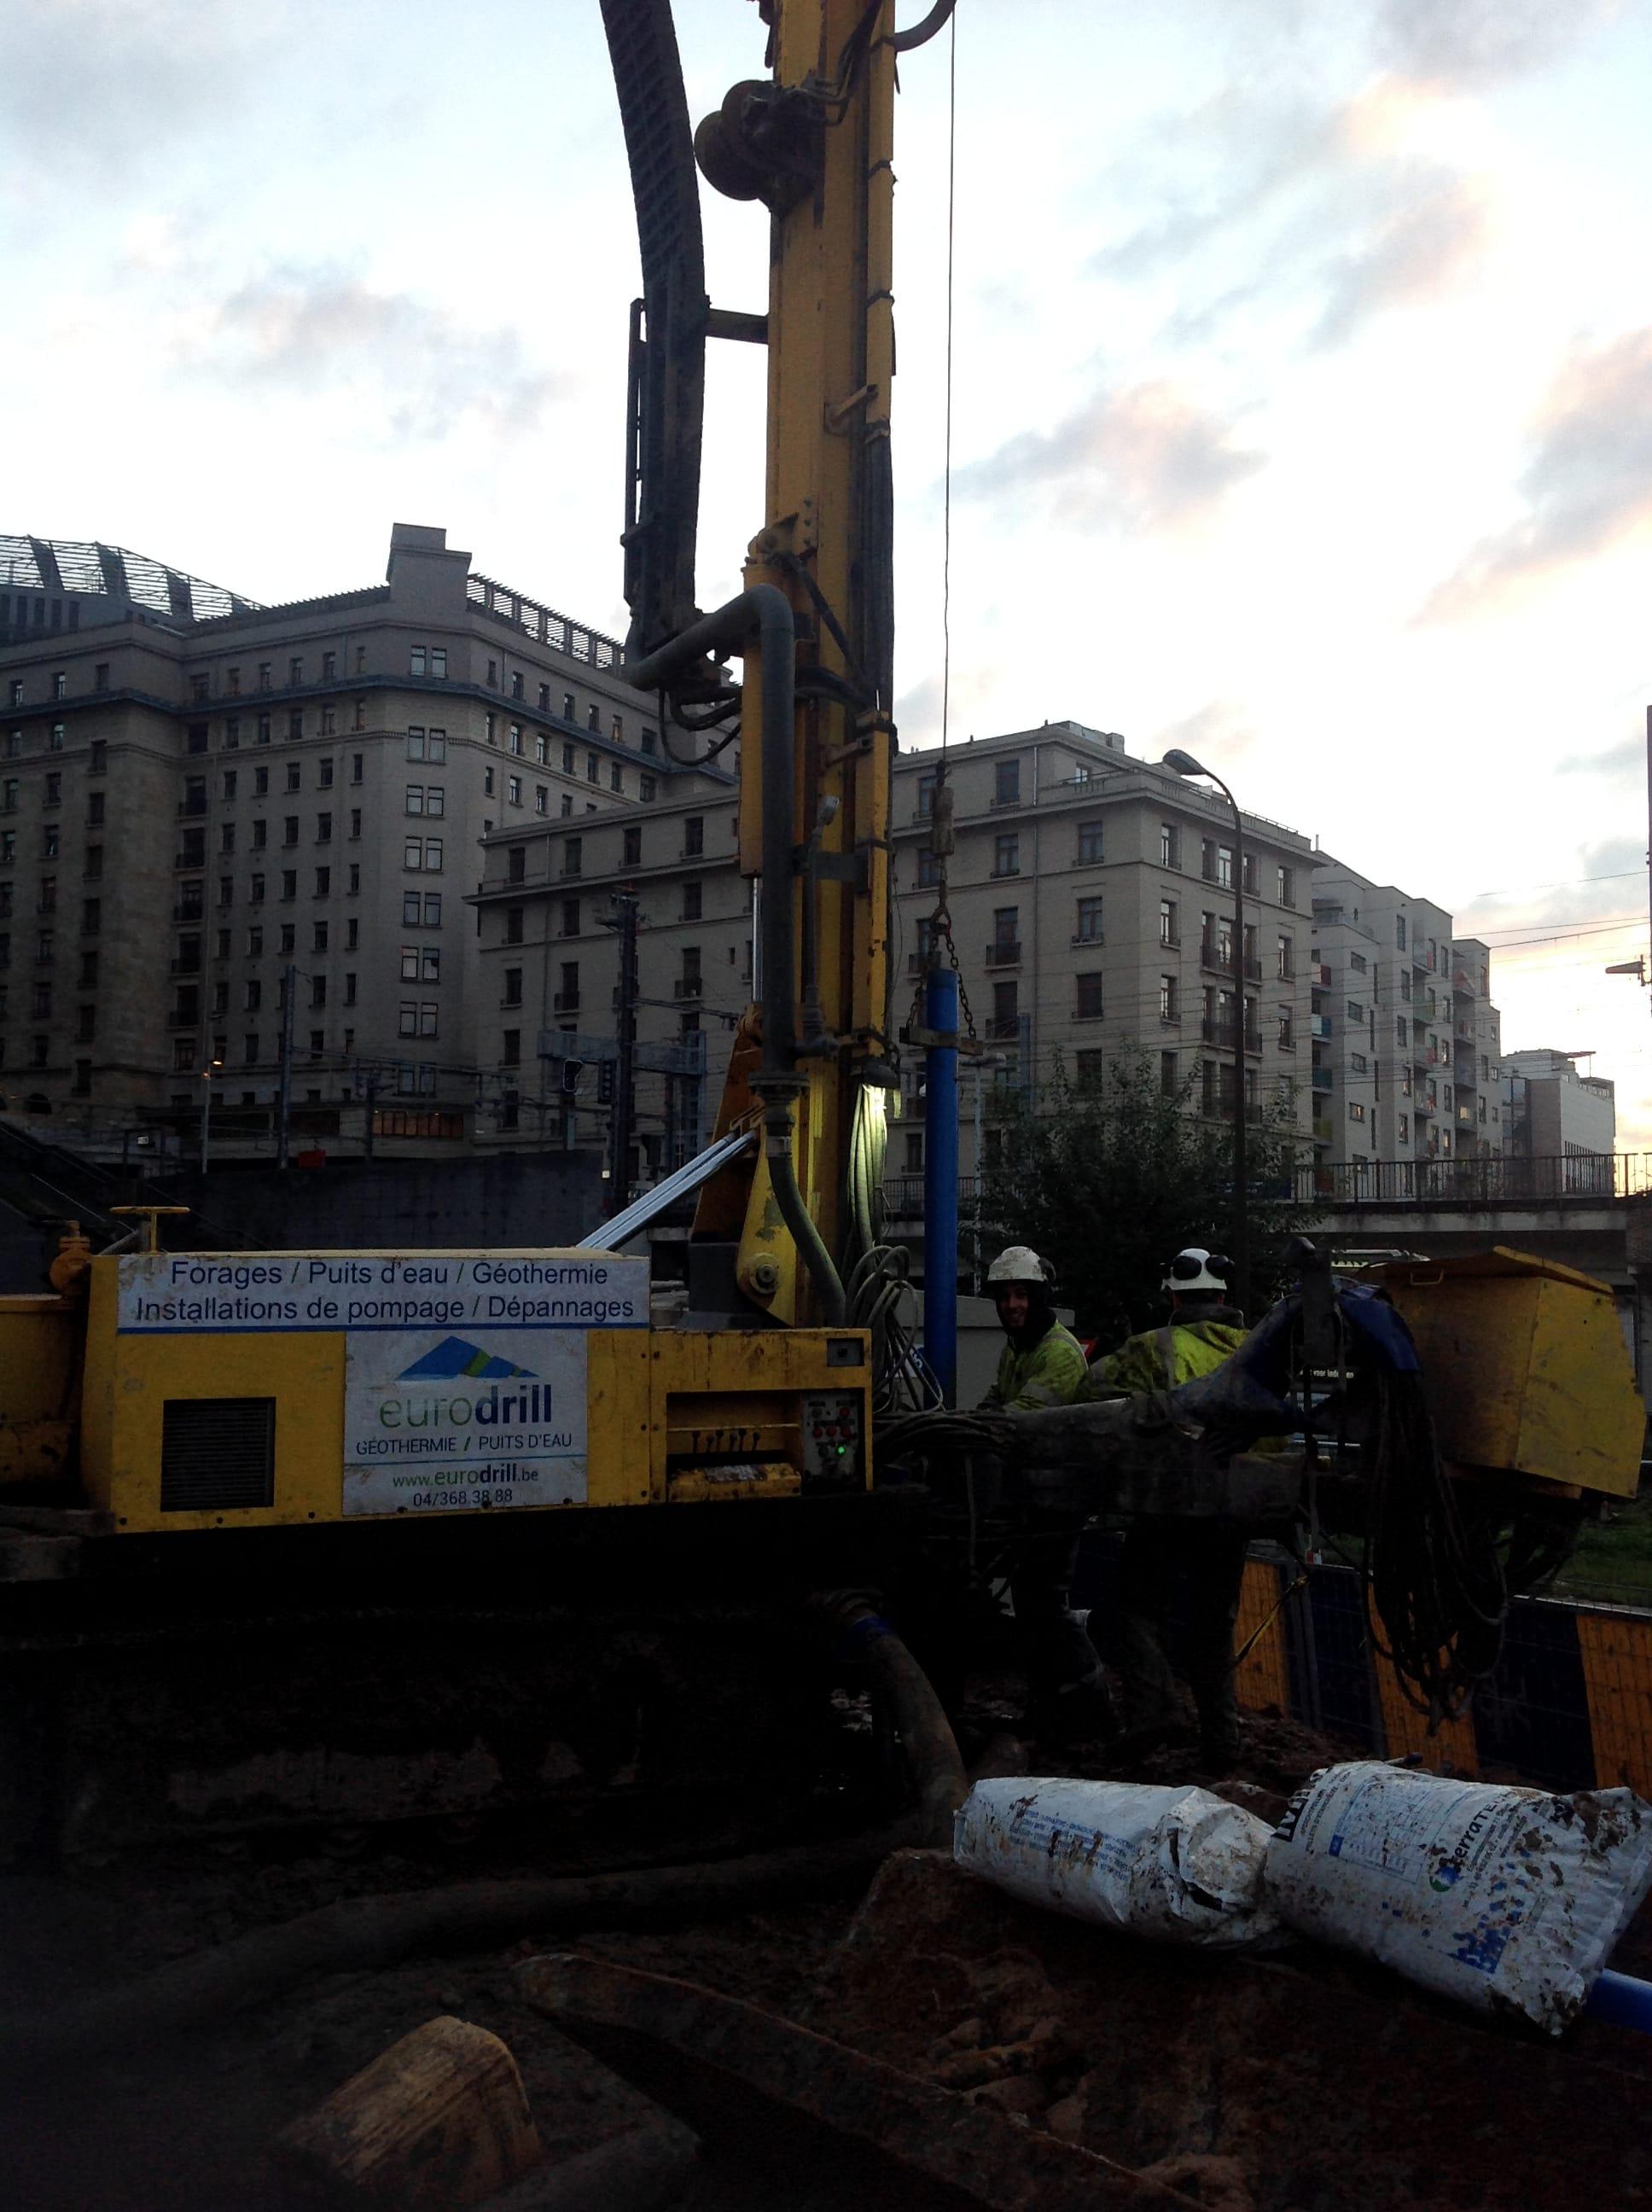 chantier-bruxelles-forage-installation-pompe-puits-geothermie-eurodrill-liege-belgique-5